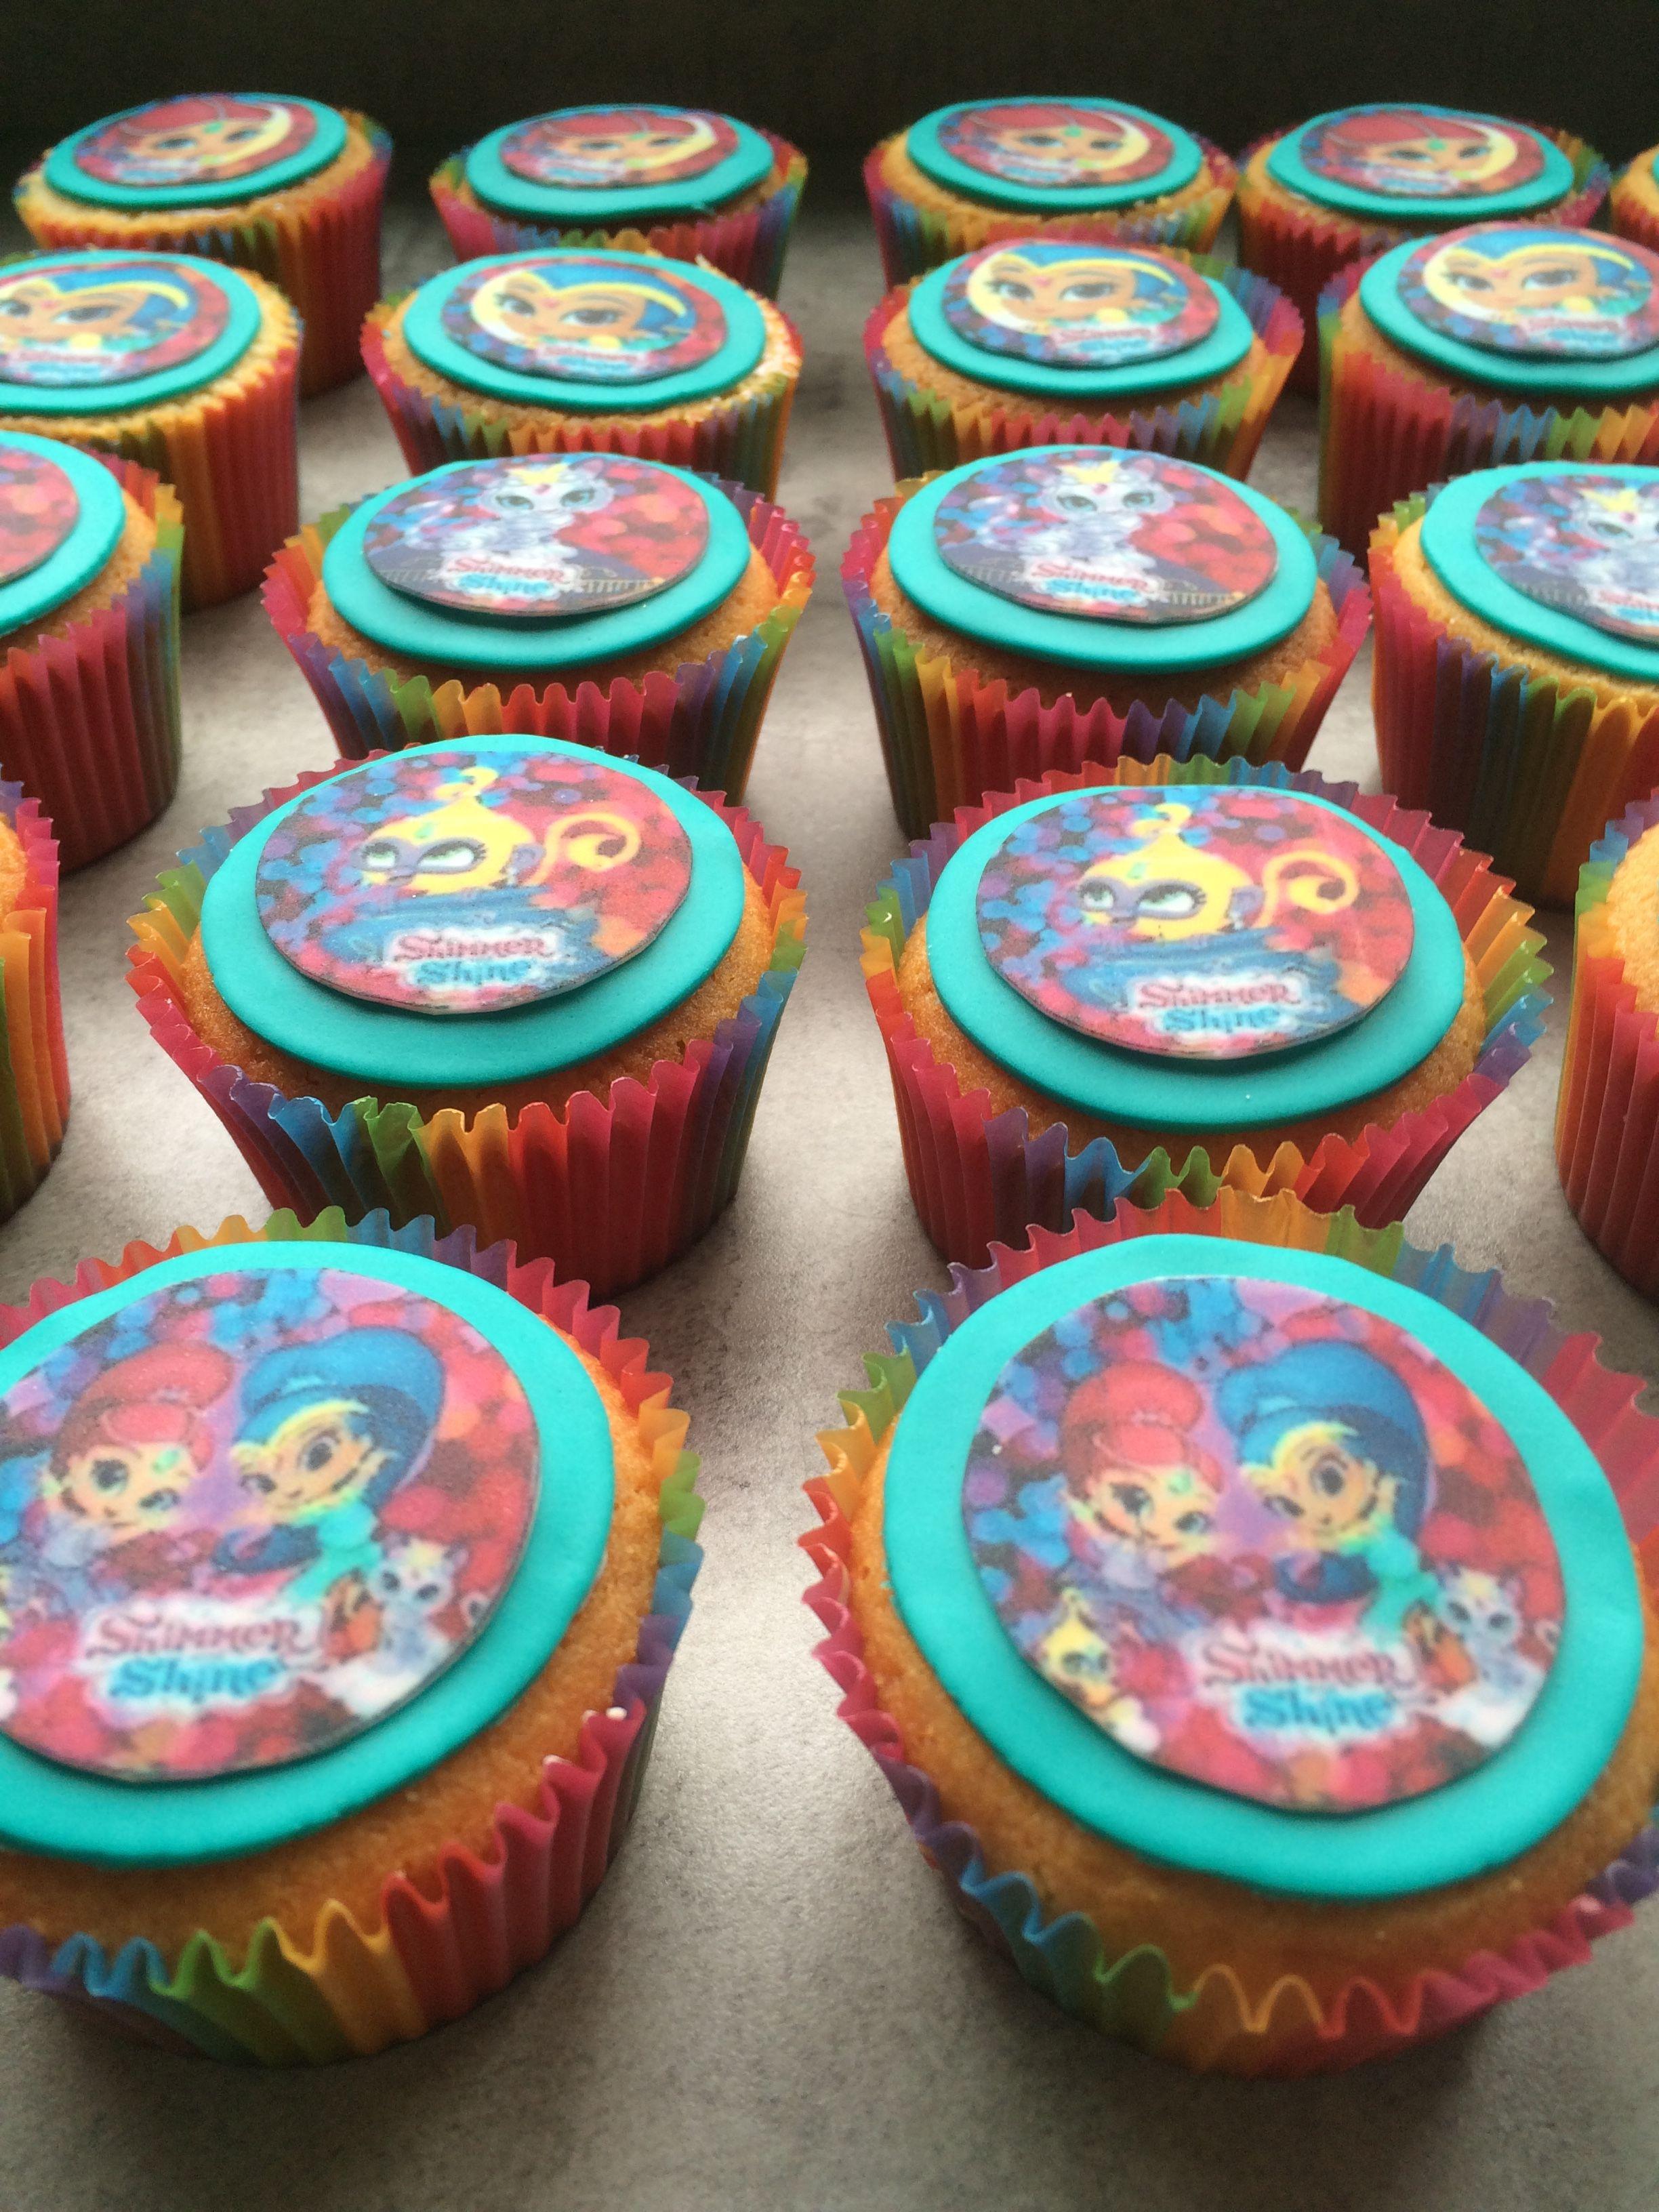 Shimmer & Shine cupcakes